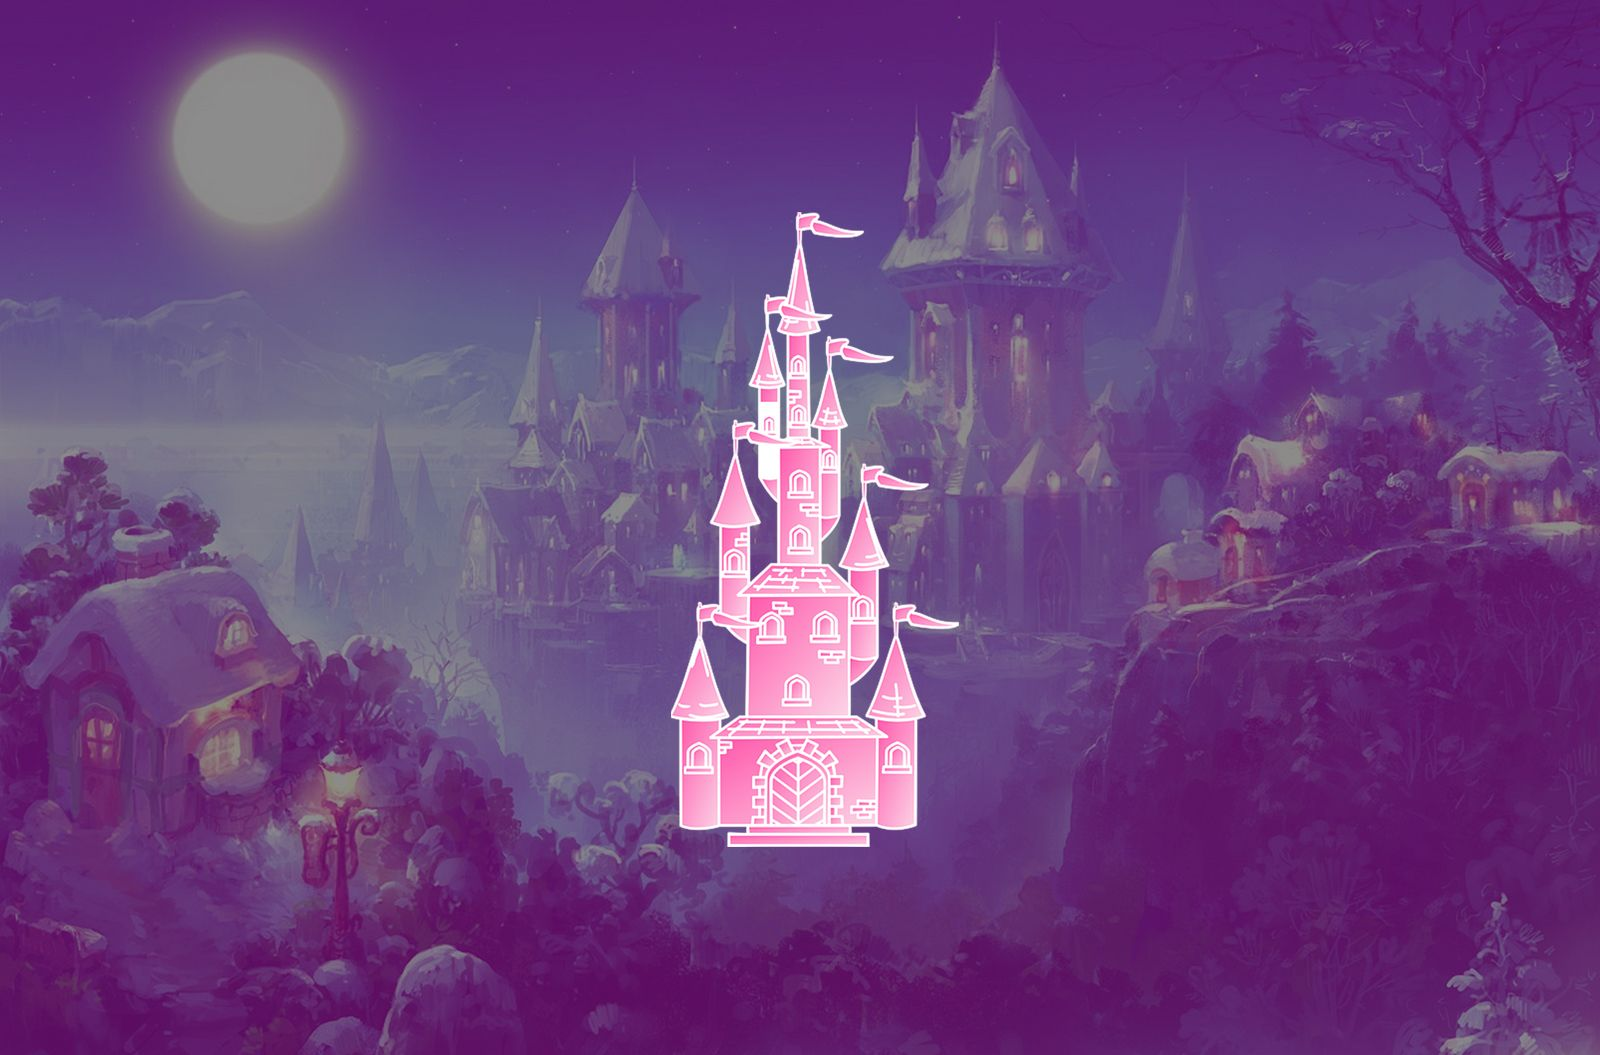 Pink Fairytale Princess Castle Wallpaper Princess Castle Fairy Tales Wallpaper